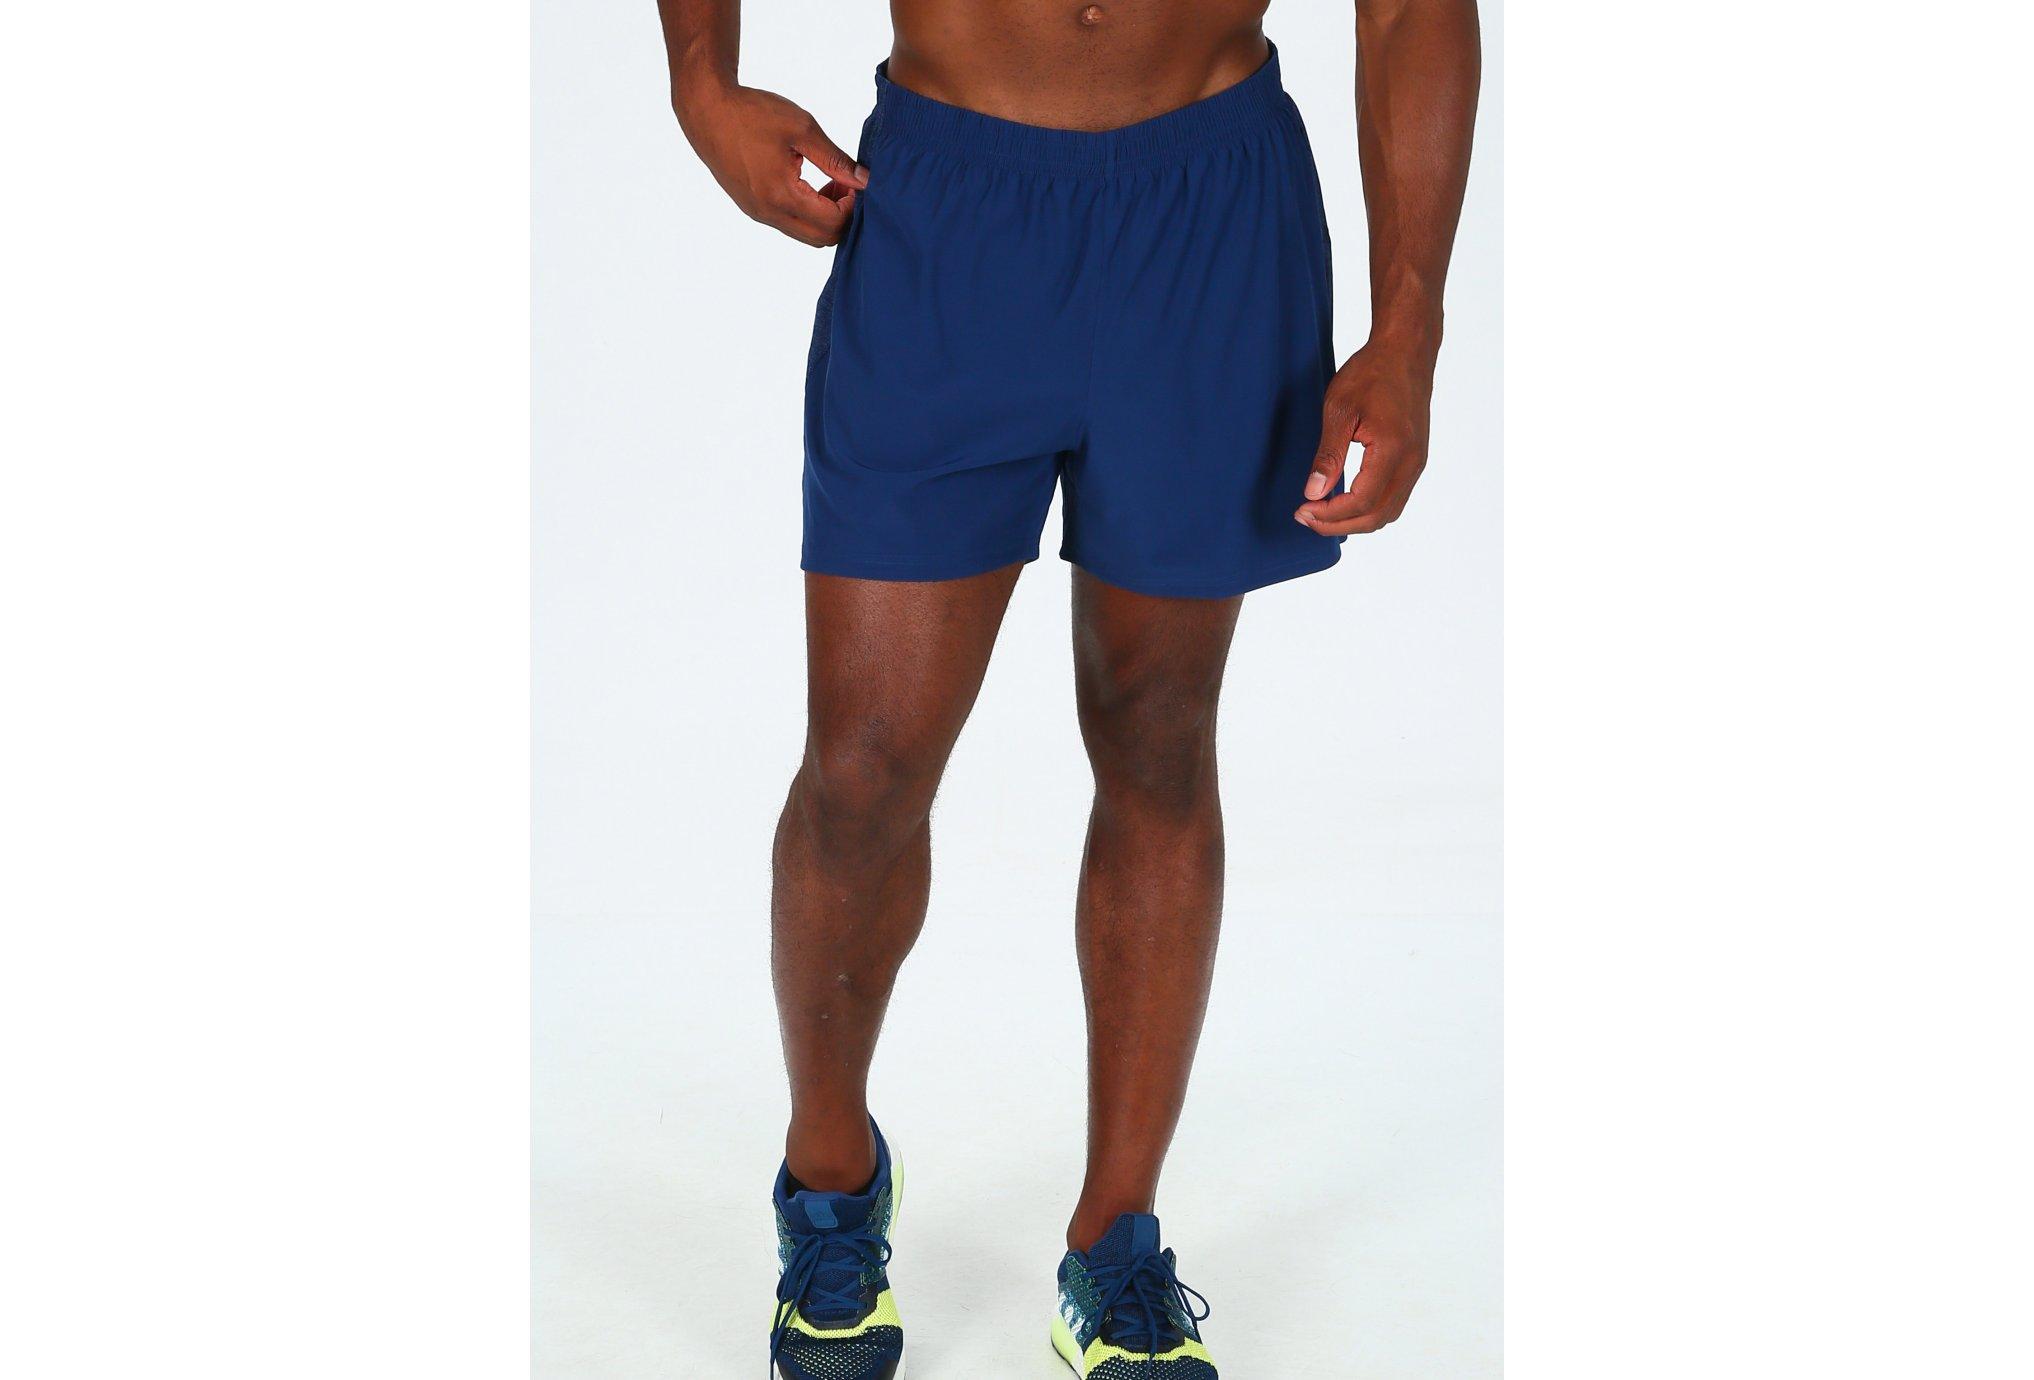 Adidas Supernova 5 diététique vêtements homme